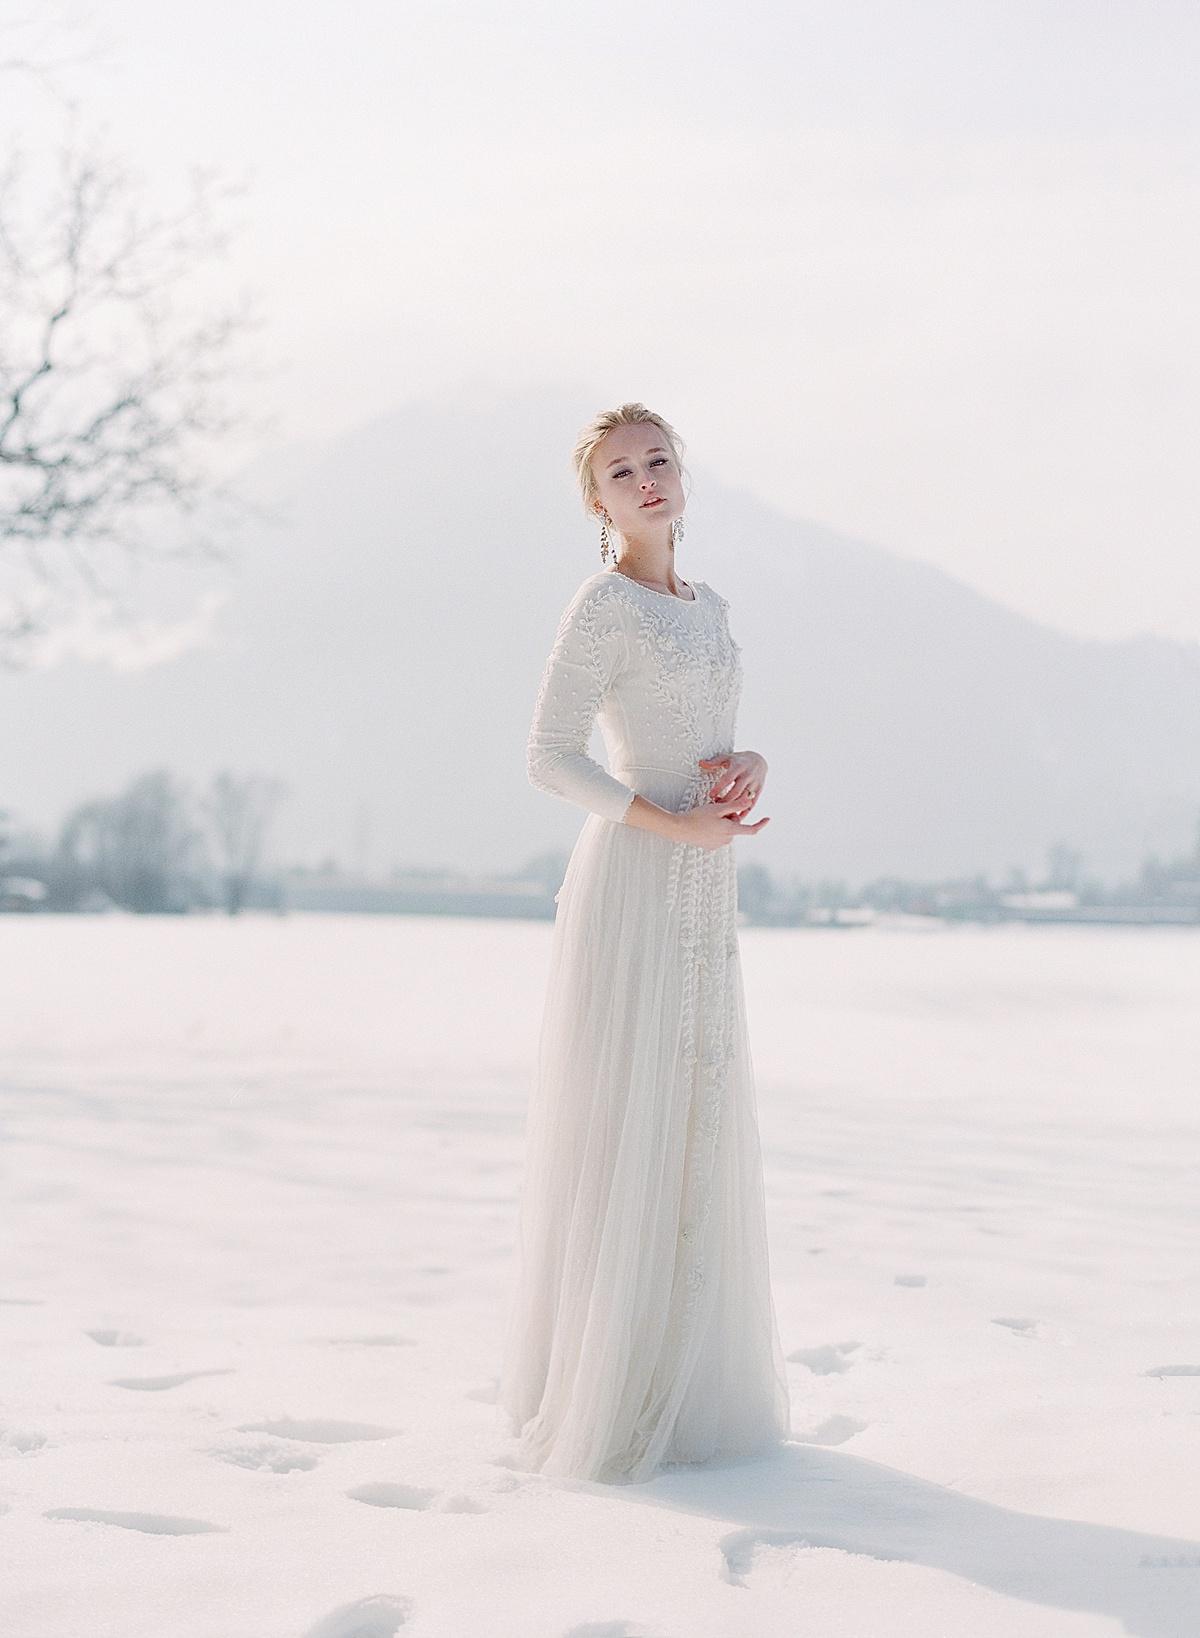 bridal-stylist-gabrielle-hurwitz.jpg